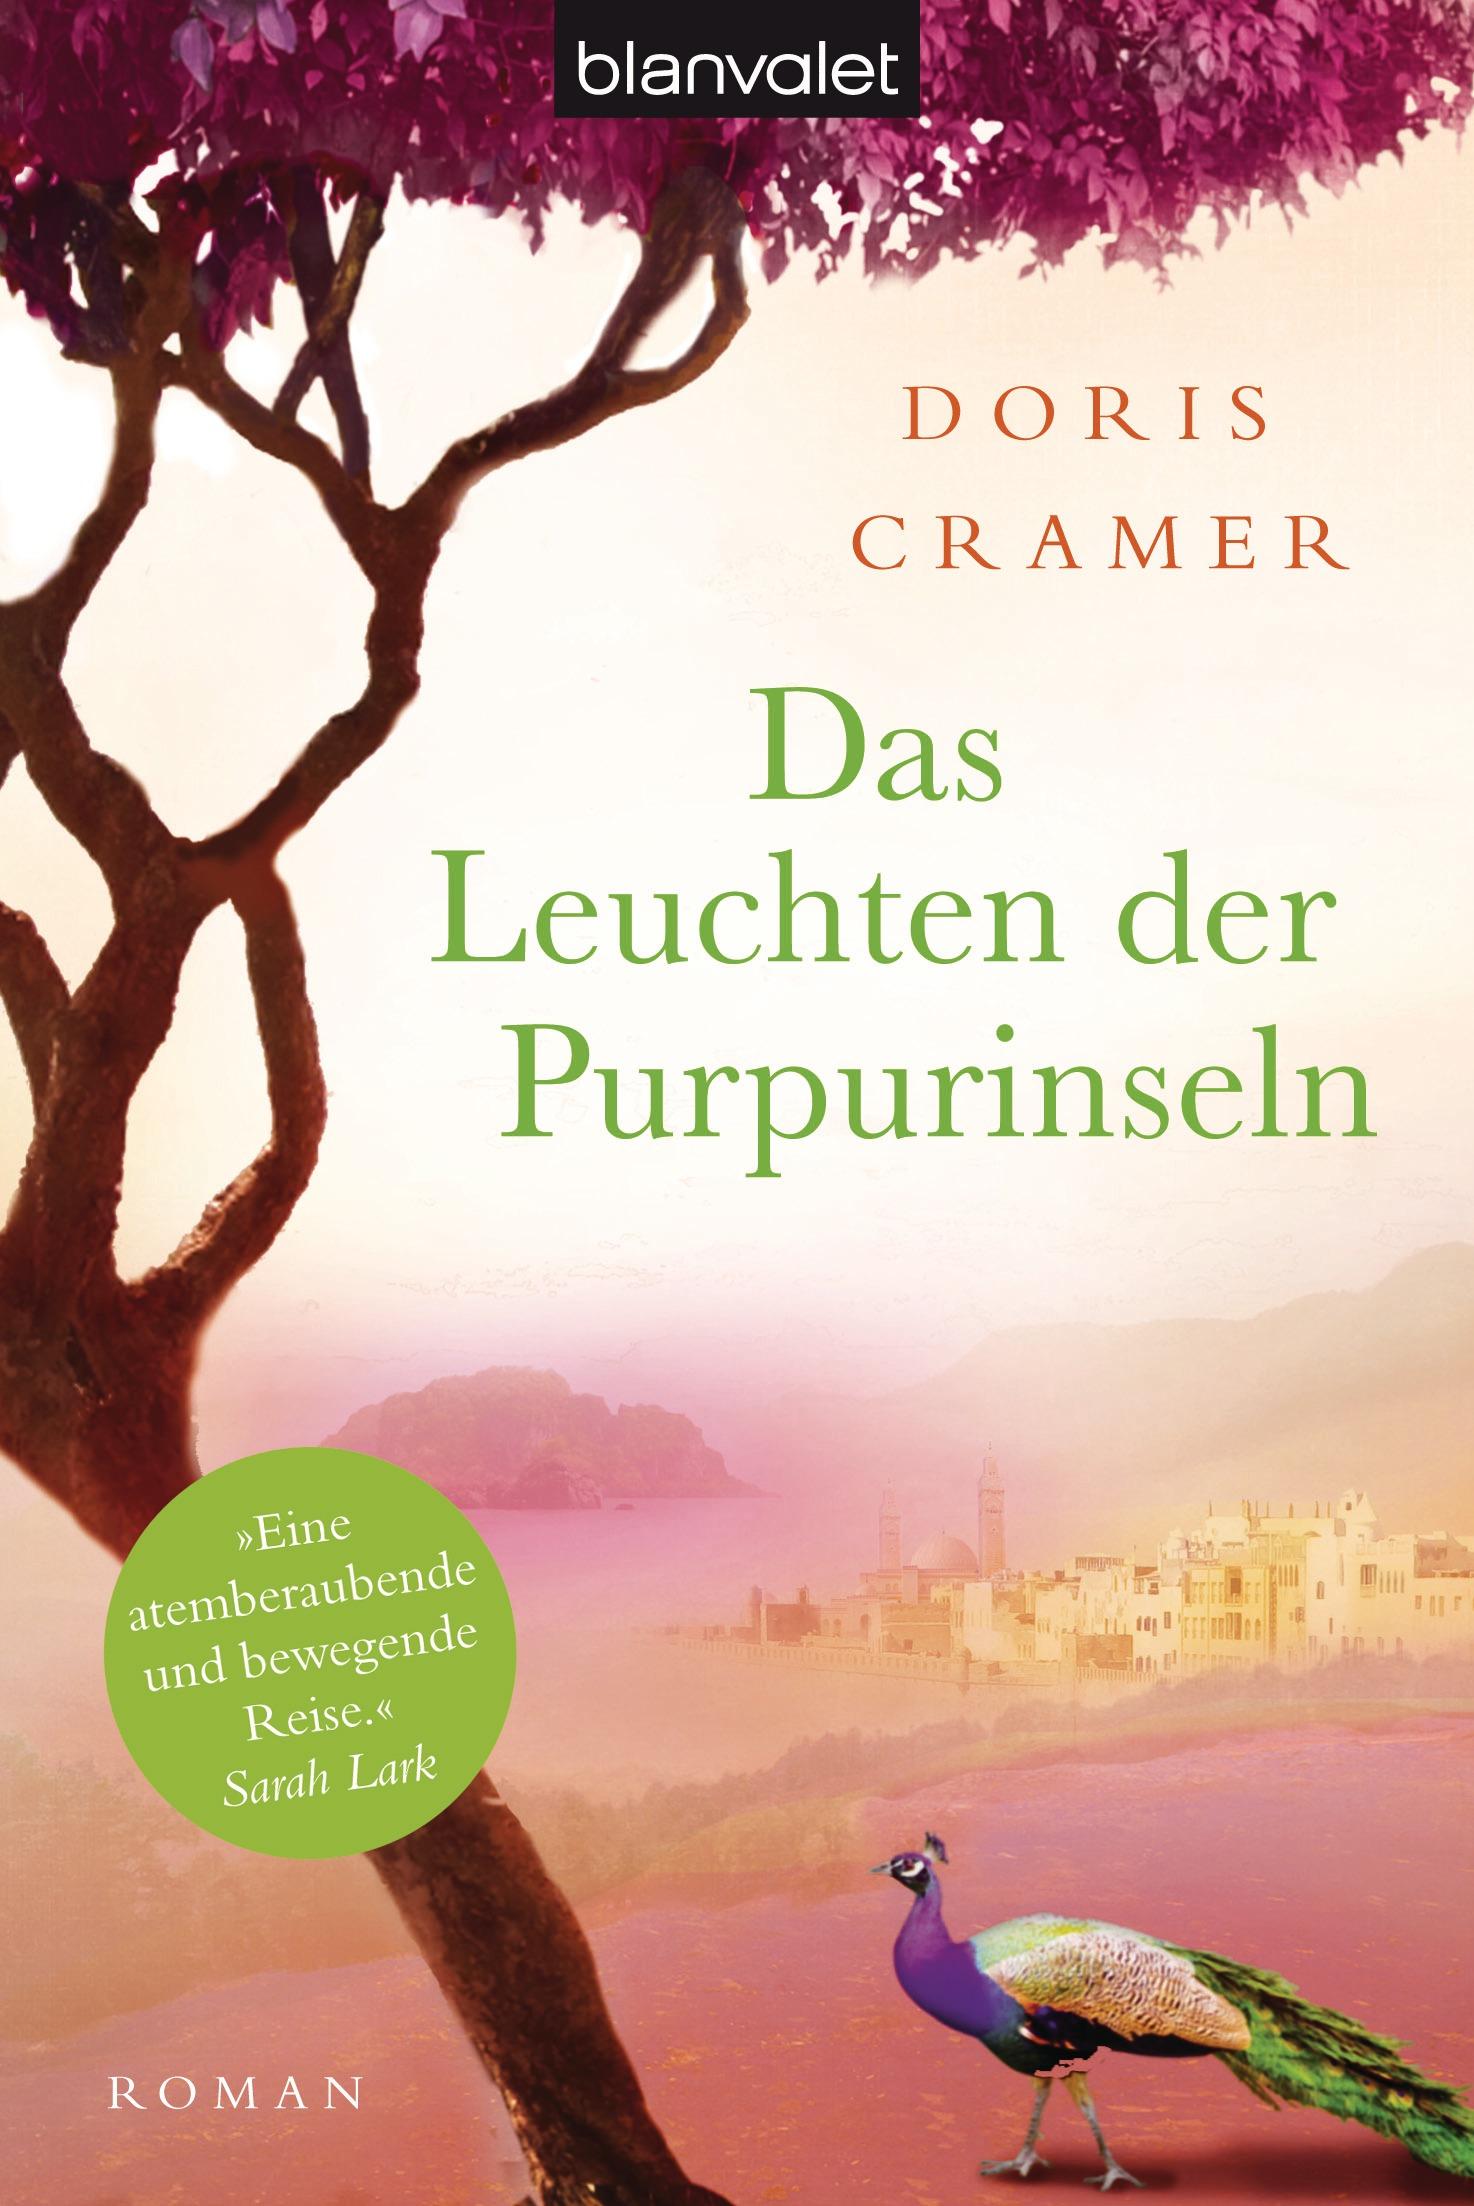 Das Leuchten der Purpurinseln: Roman - Doris Cramer